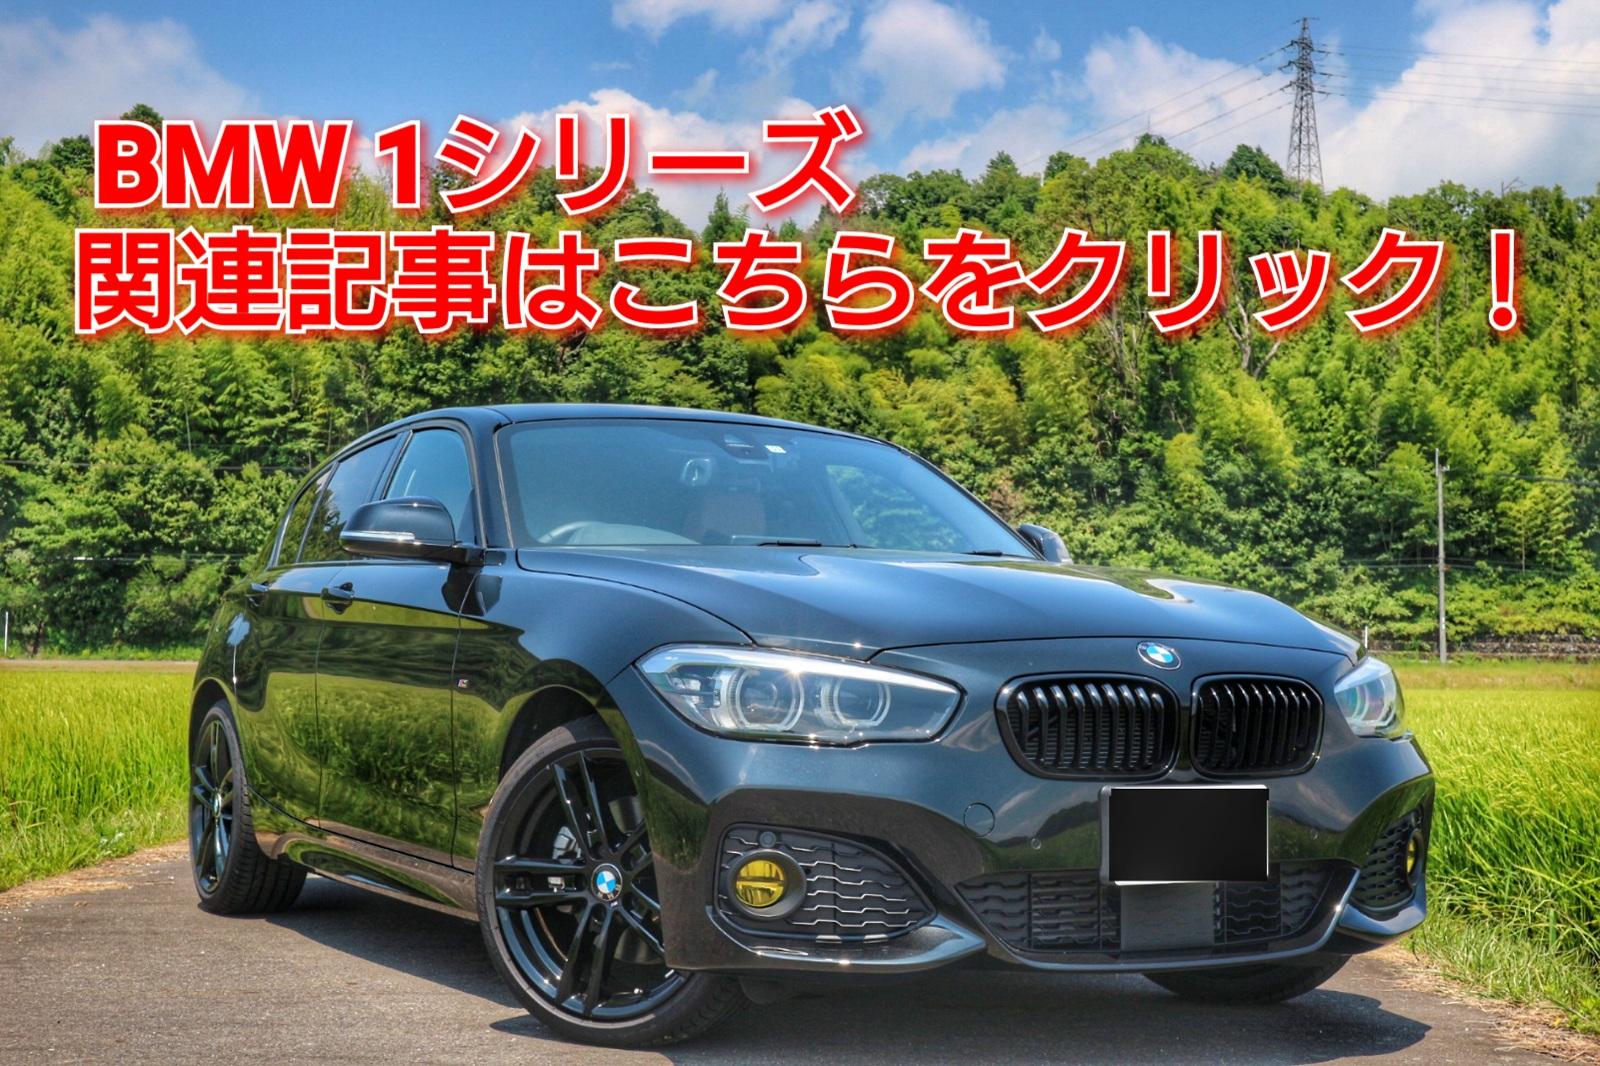 BMW1シリーズ関連記事まとめ